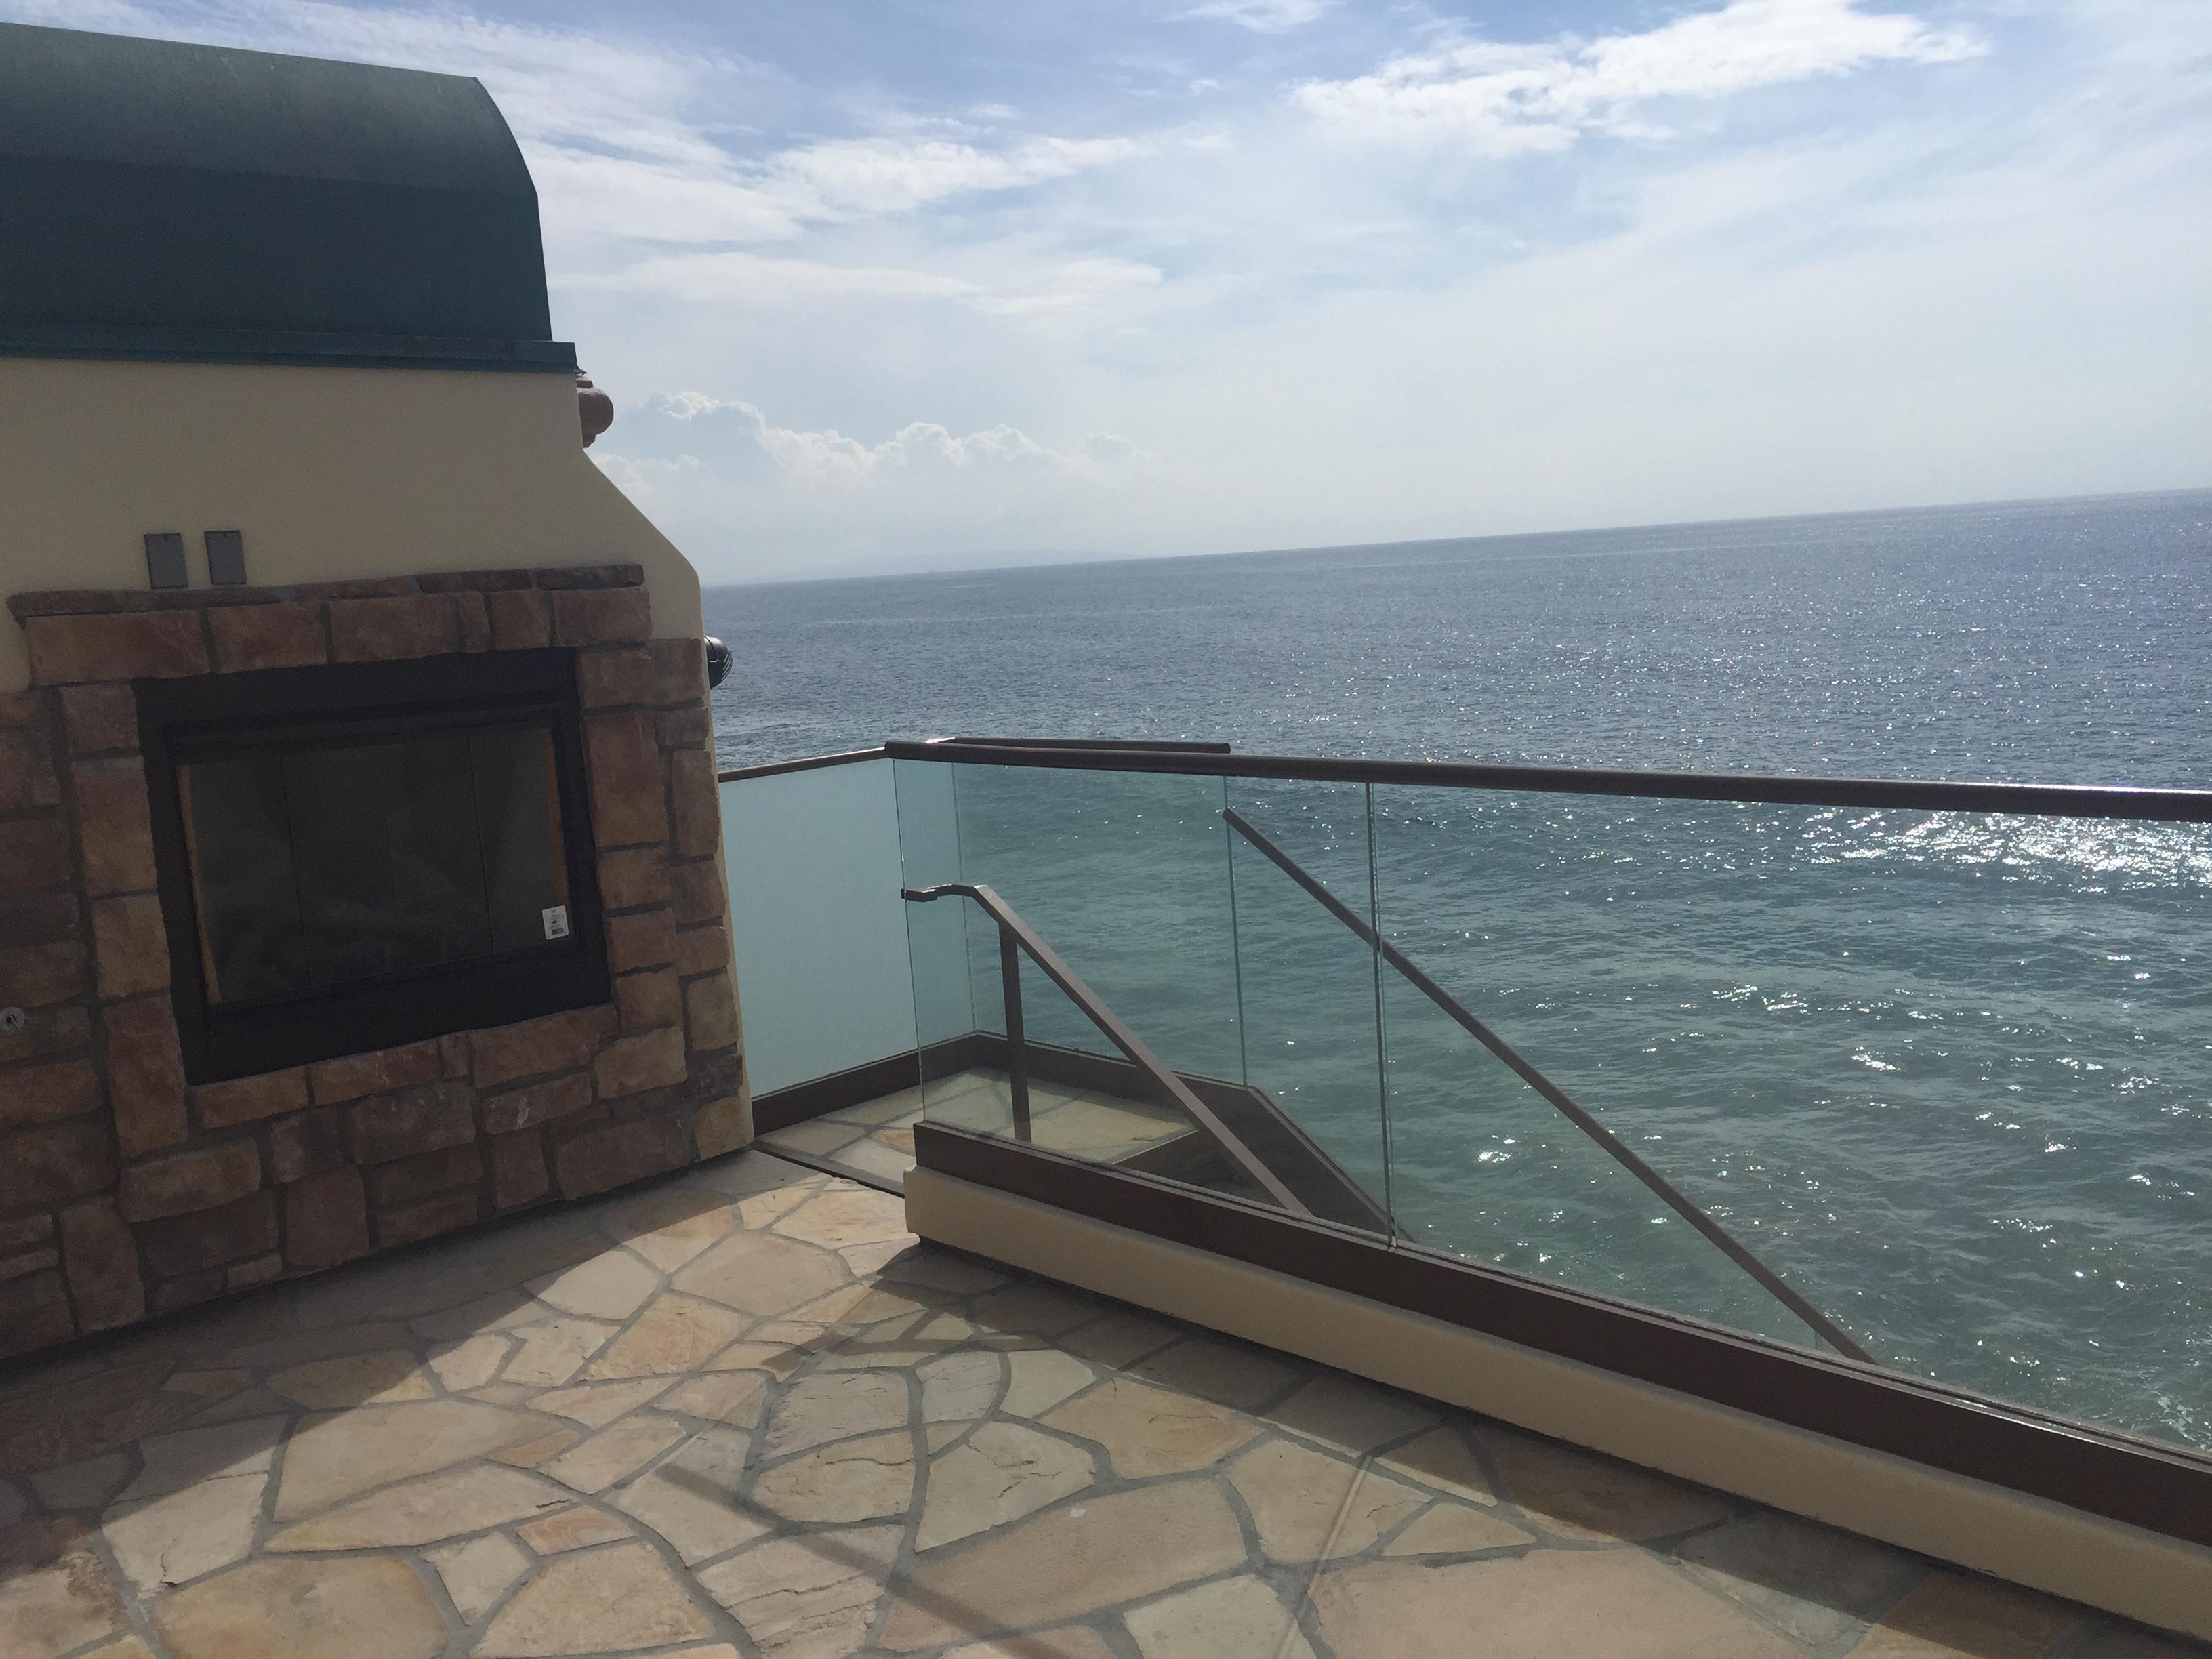 Sliding Patio Screen doors installed in Malibu home